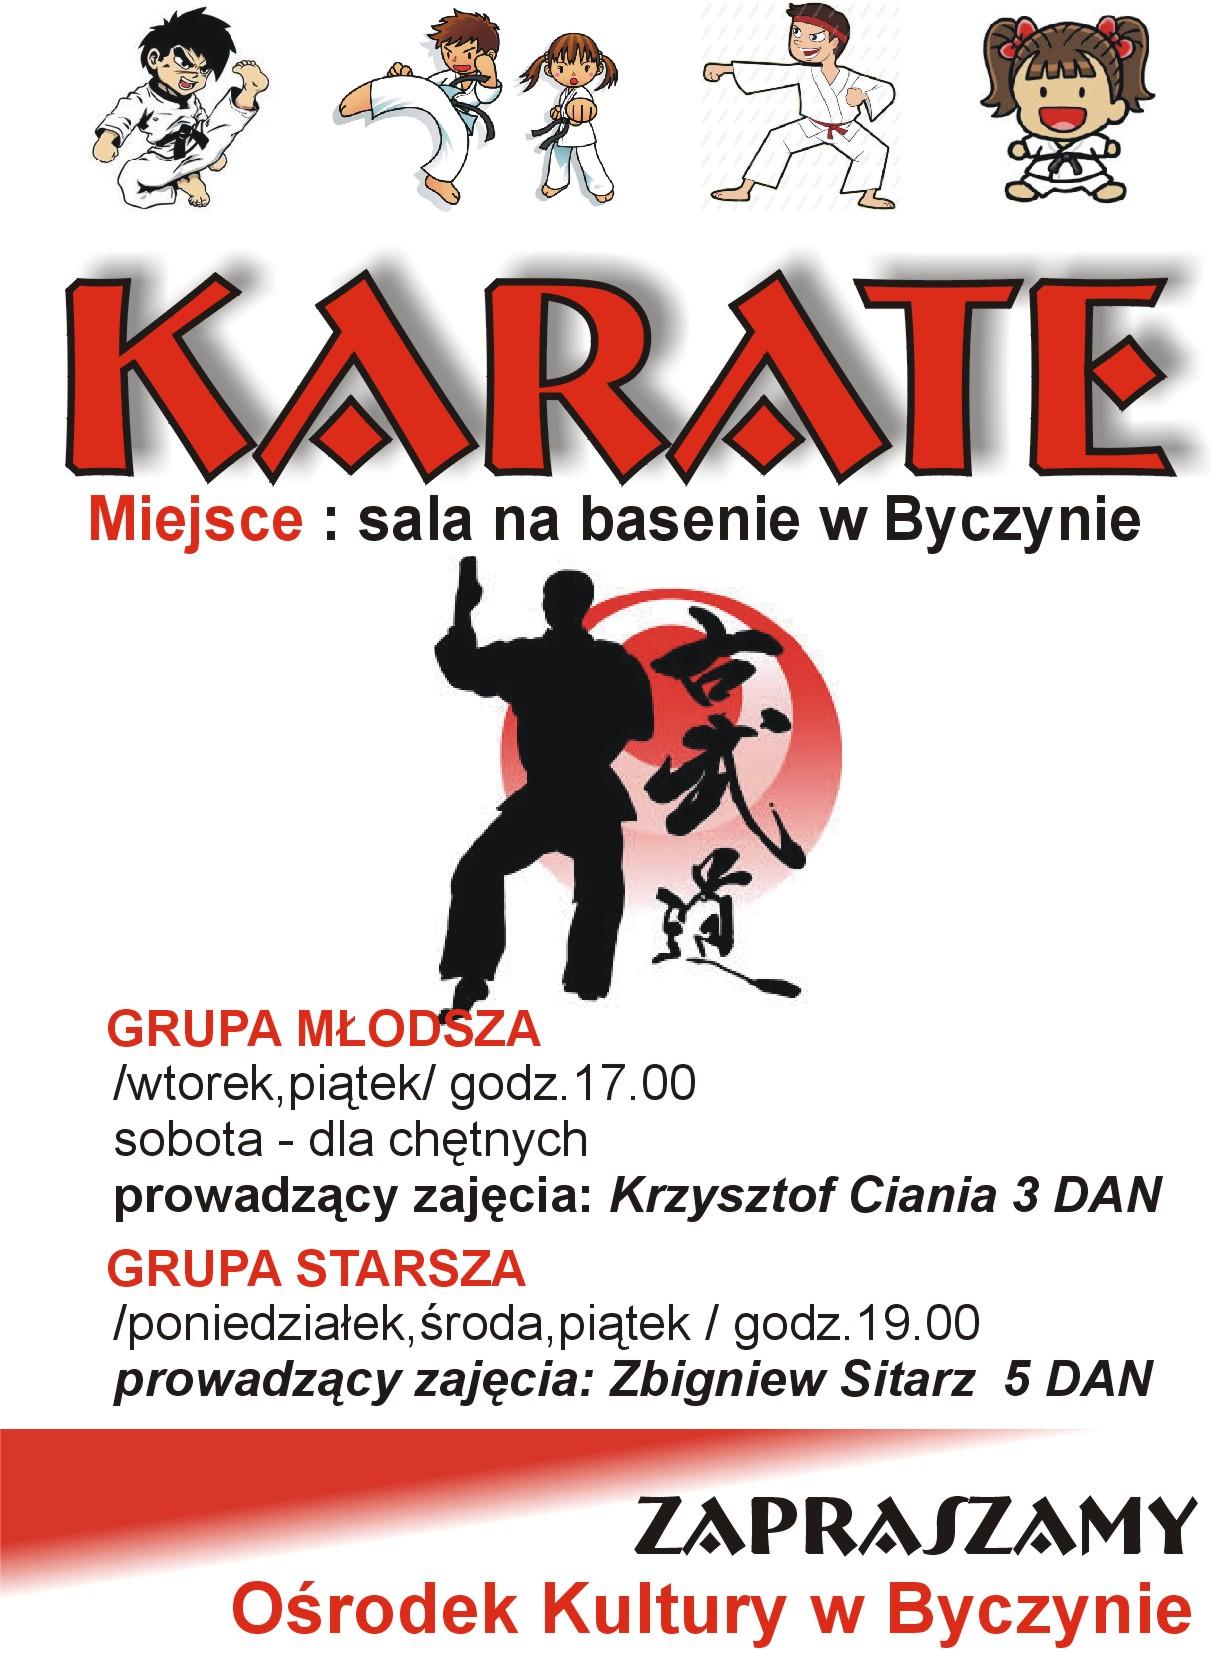 karate2013.jpeg